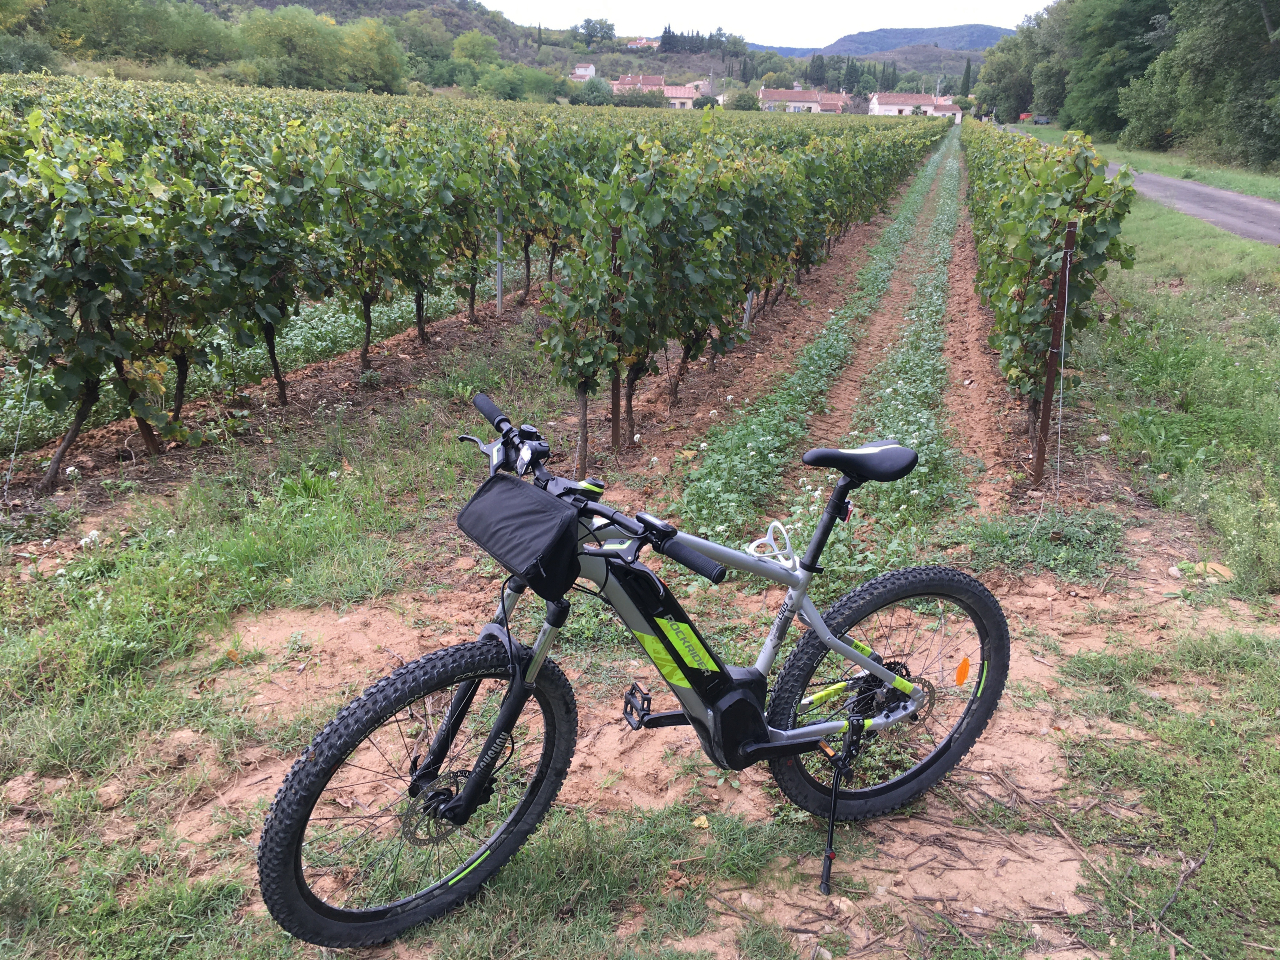 Rockrider ebike from Decathlon in vineyard in Aude France